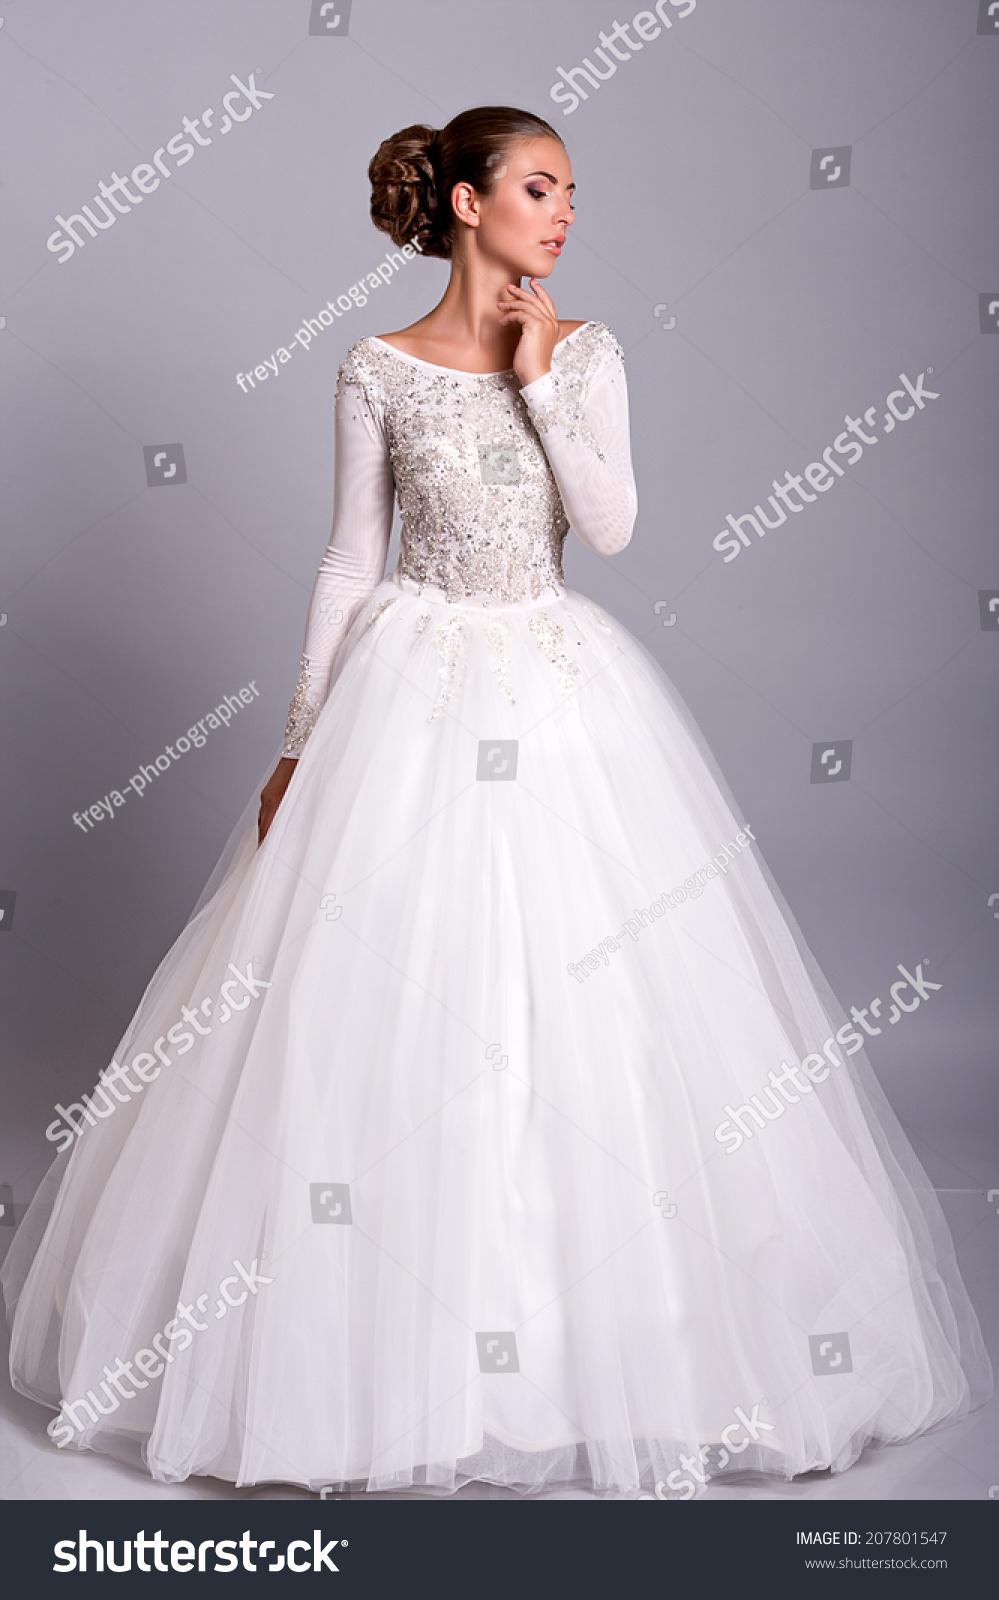 Photos Shutterstock Beautiful Bride Photos 25